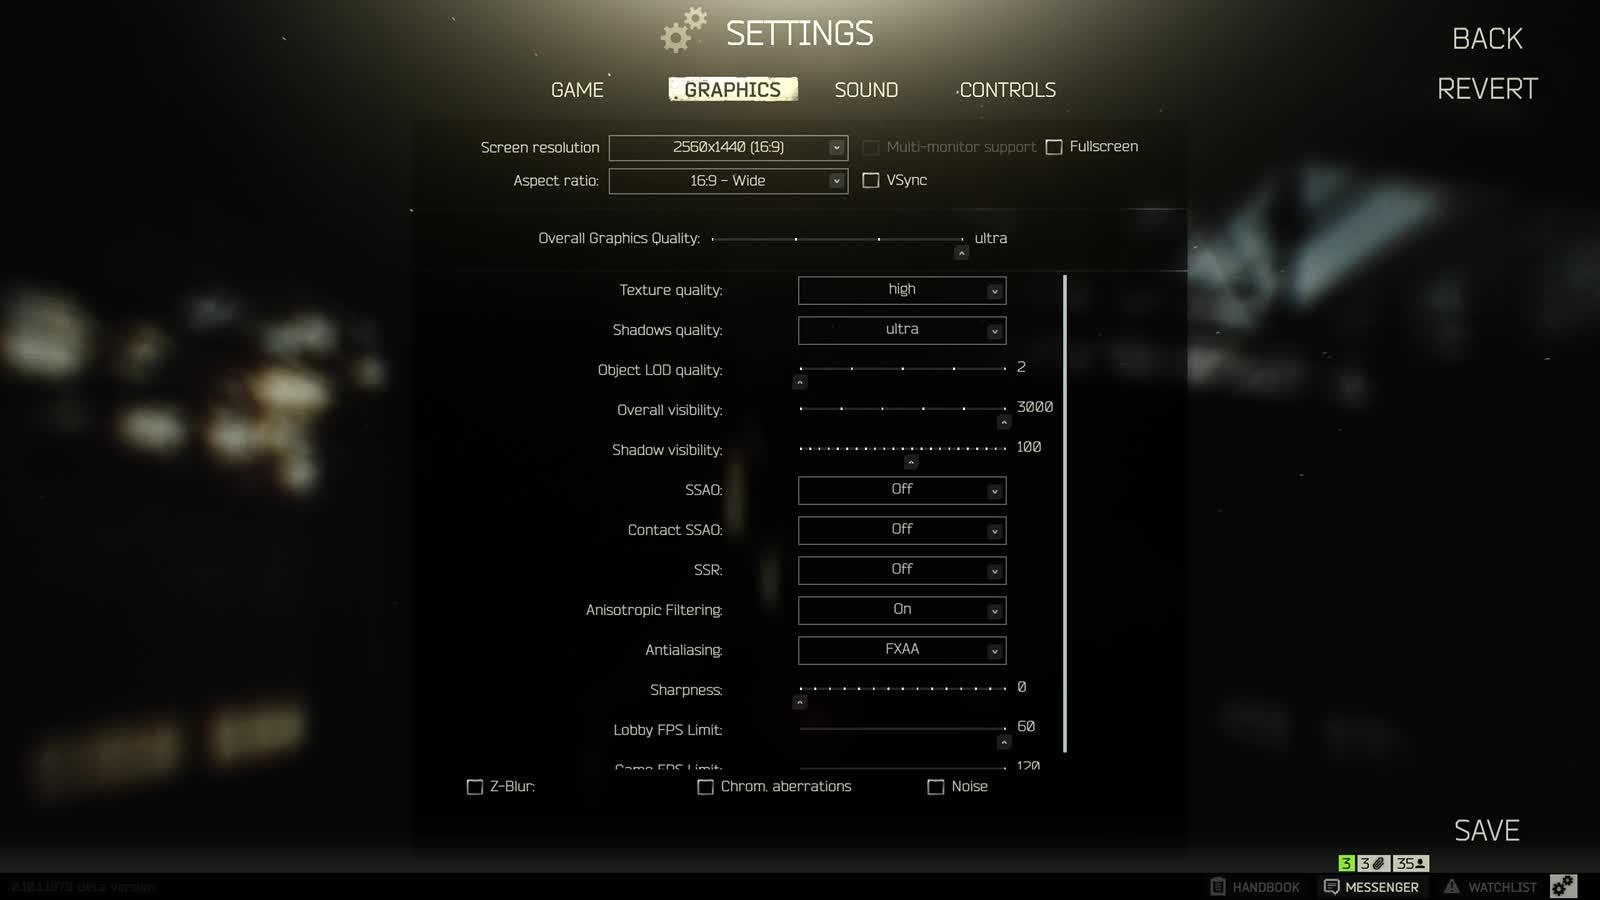 EFT 0 10 Settings - Twitch